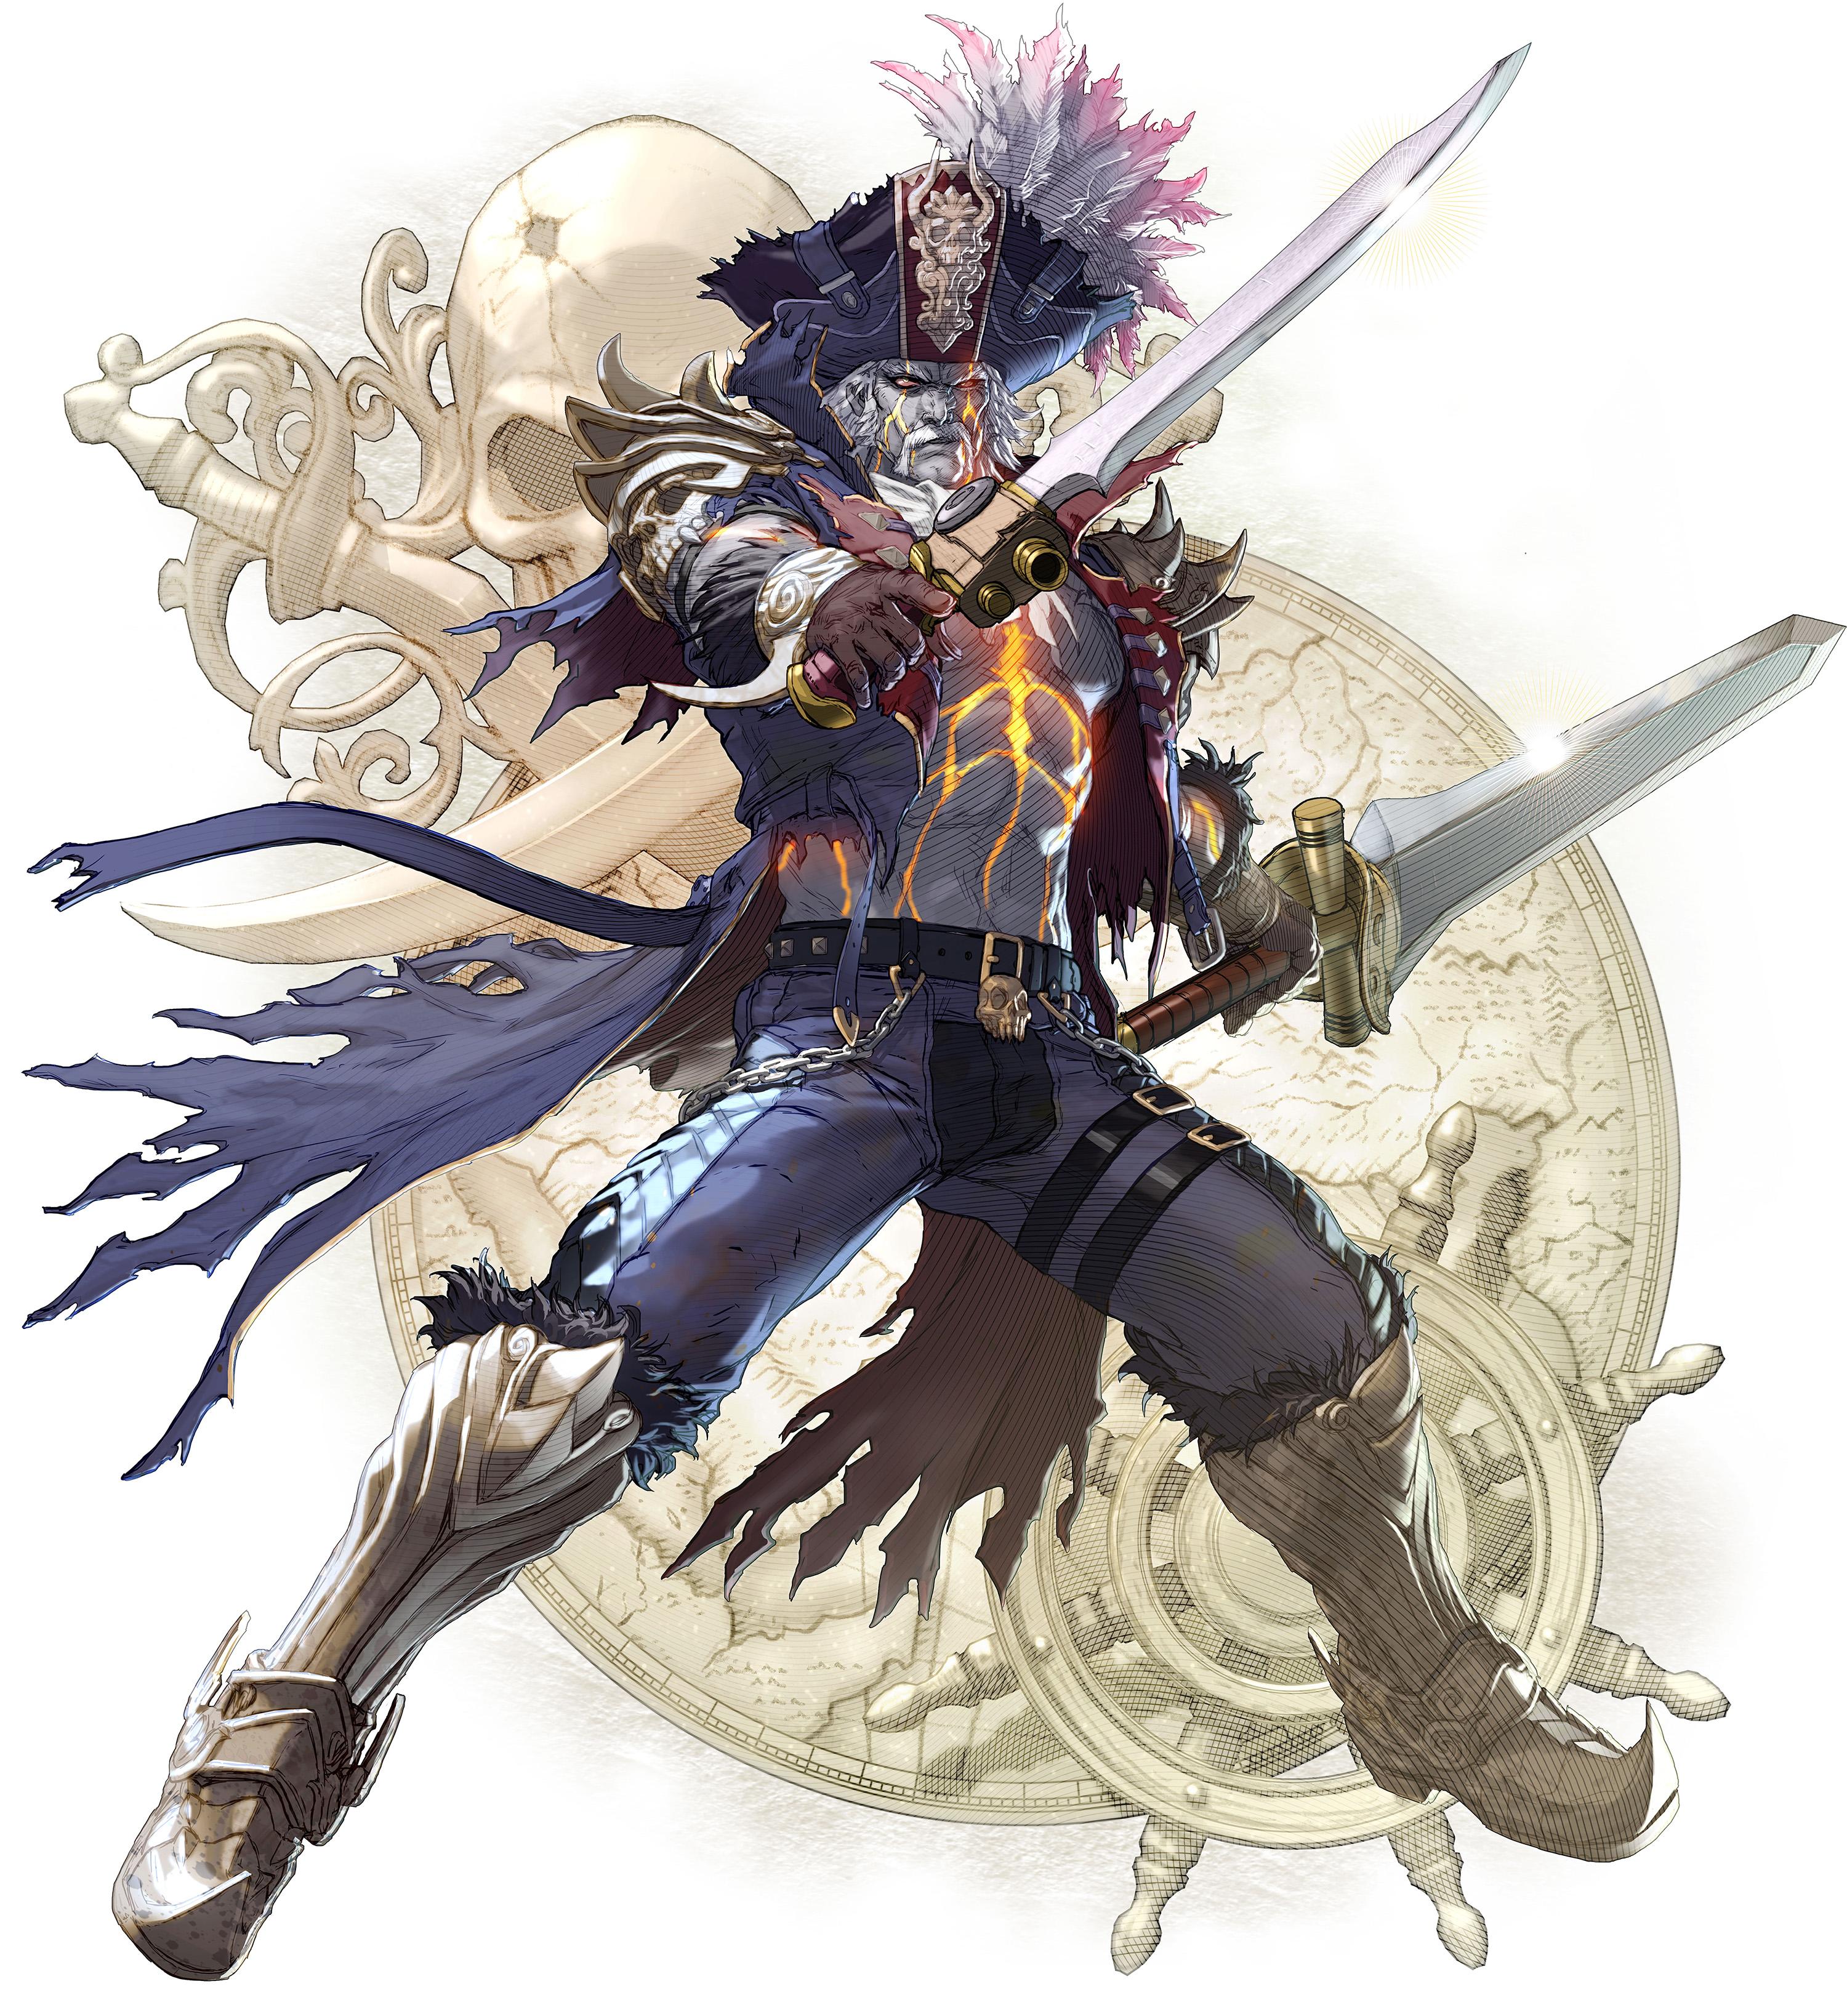 Soulcalibur VI Cervantes Character Artwork